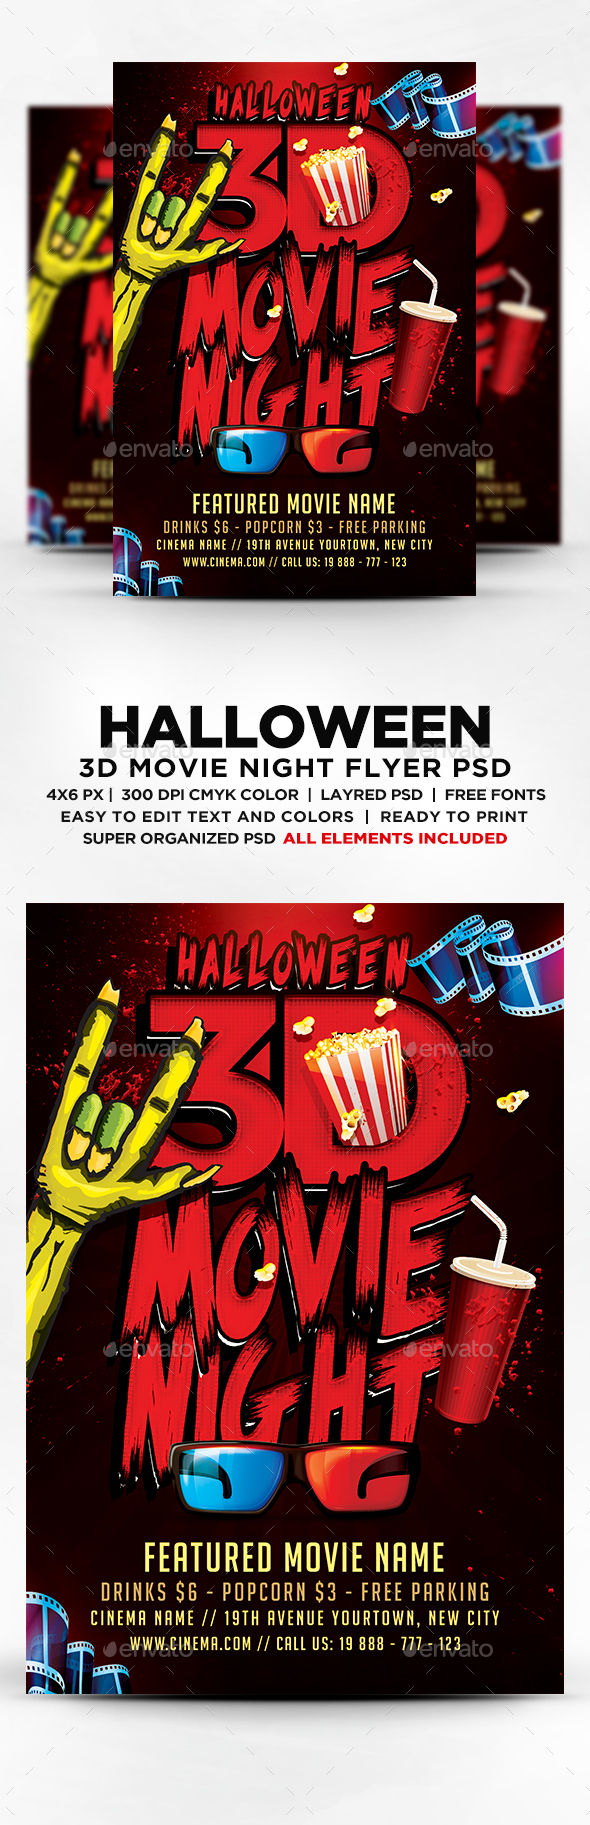 Halloween 3D Movie Night Flyer — PSD Template #movie party #movie ...